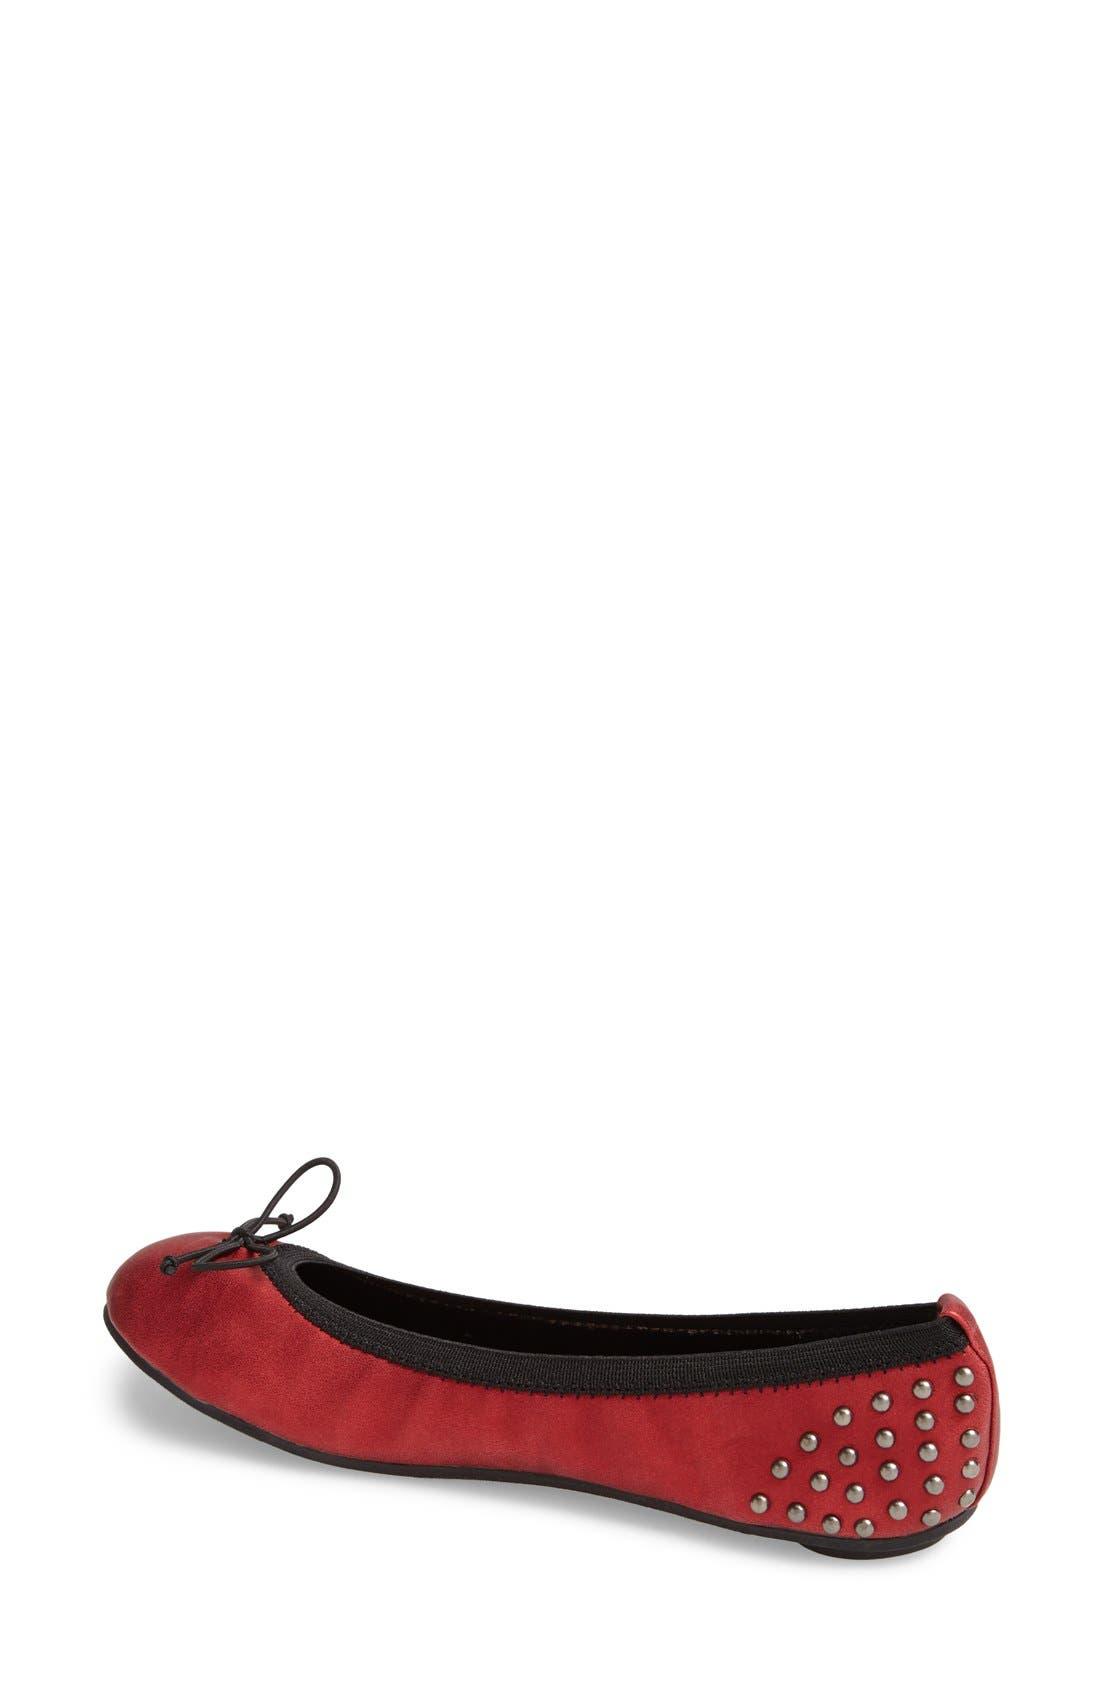 Alternate Image 2  - Footzyfolds 'Tonya' Foldable Ballet Flat (Women)